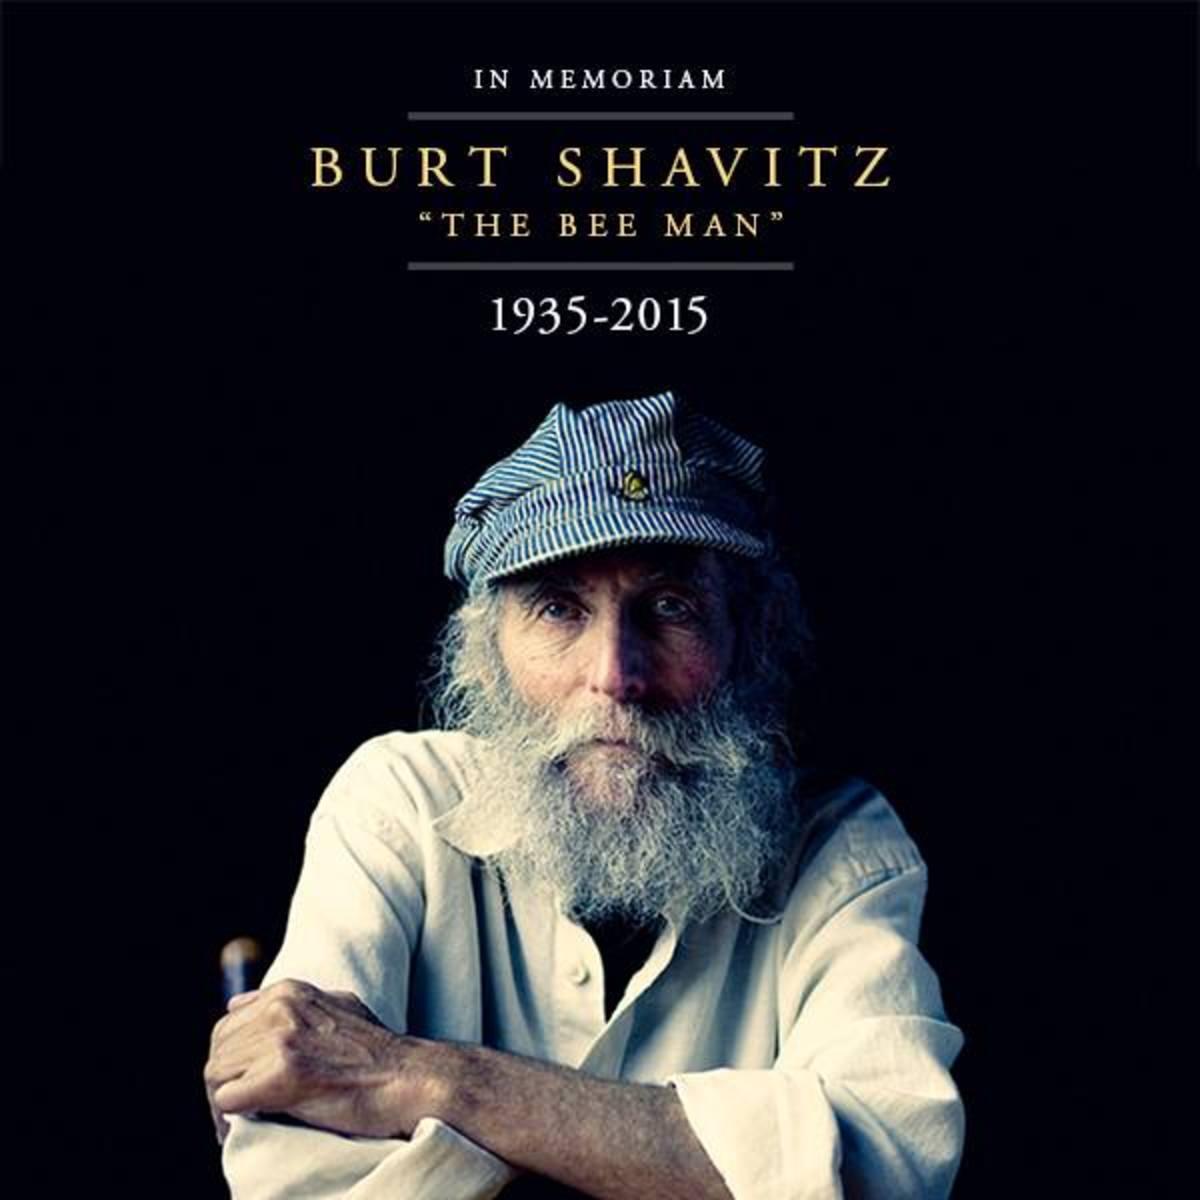 burts bees burt shavitz dead at 80